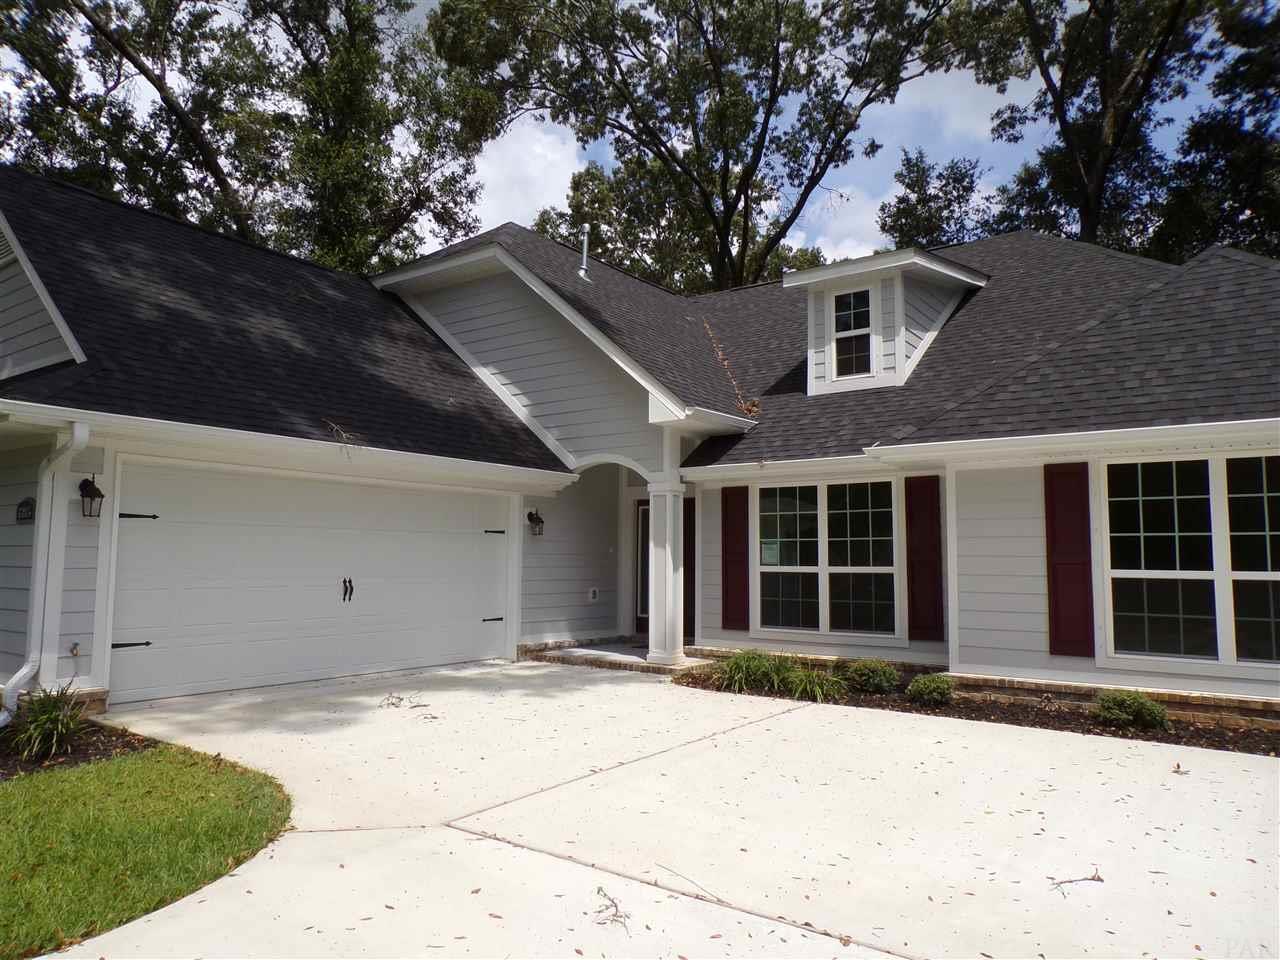 6085 Twenty One Oaks Dr, Pensacola, FL 32526